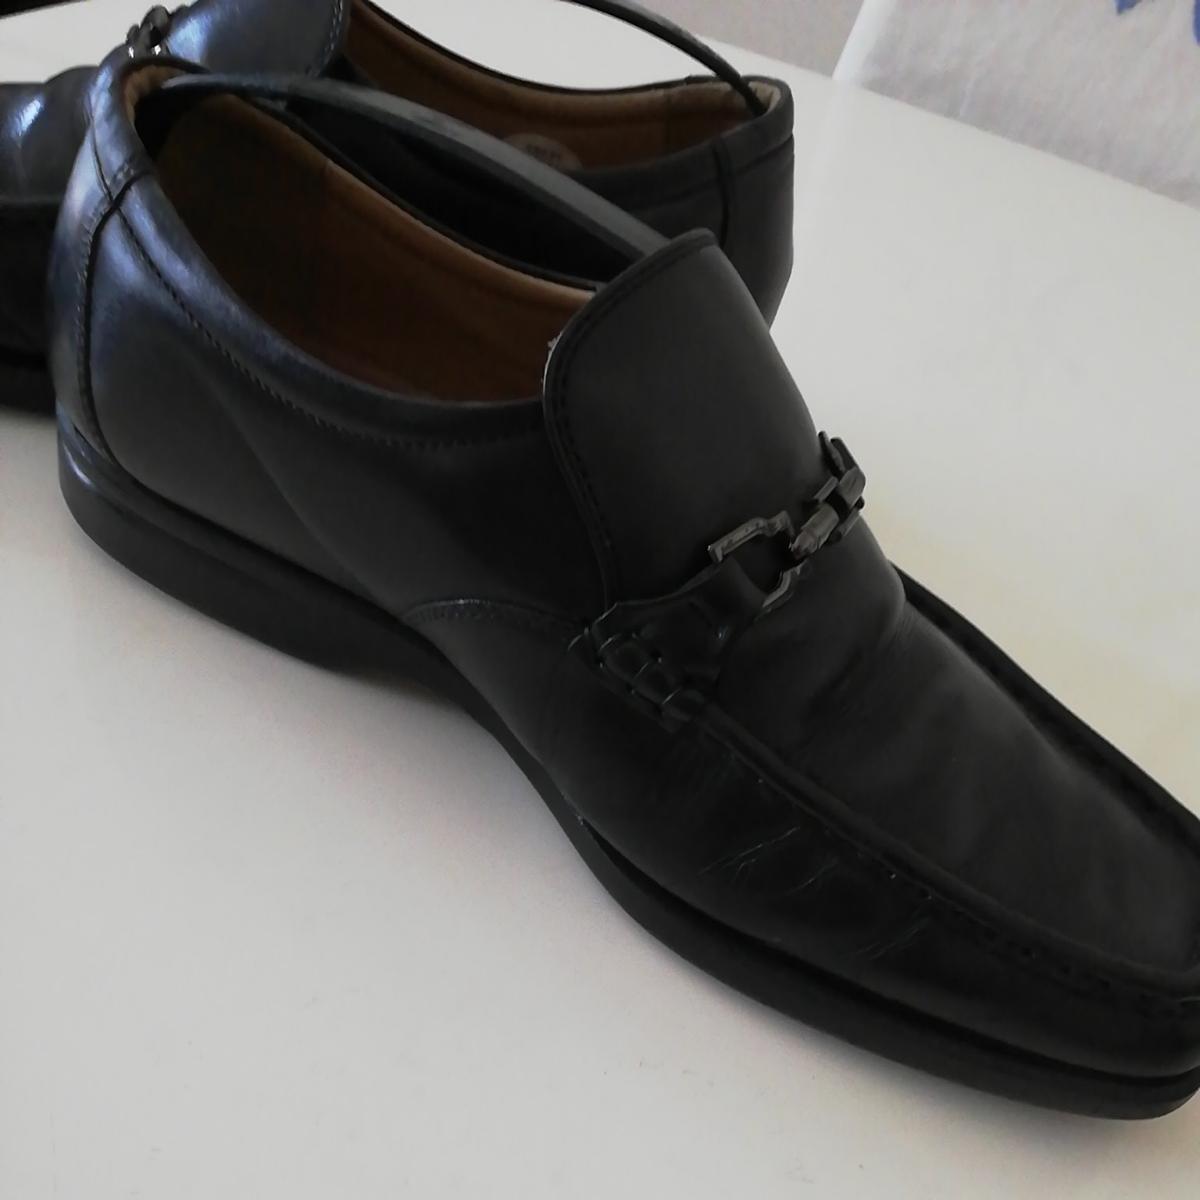 ★BURBERRY LONDON★26cm レザービットローファー バーバリーロンドン メンズ 黒 本革 ビジネスシューズ 本皮 スリッポン 革靴 定番_画像9